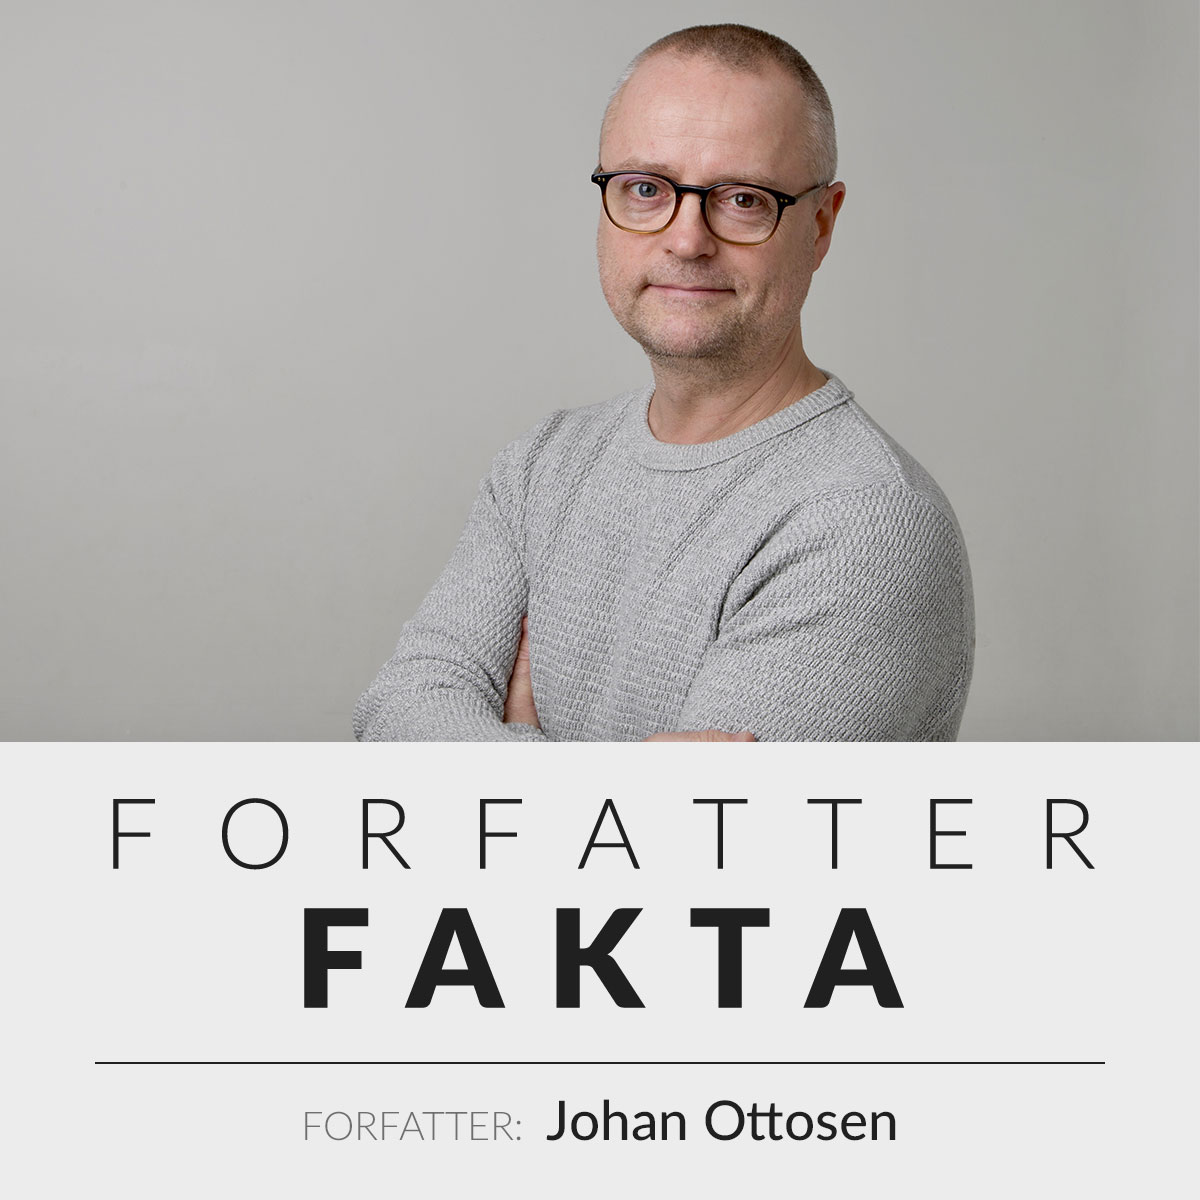 Forfatter Johan Ottosen